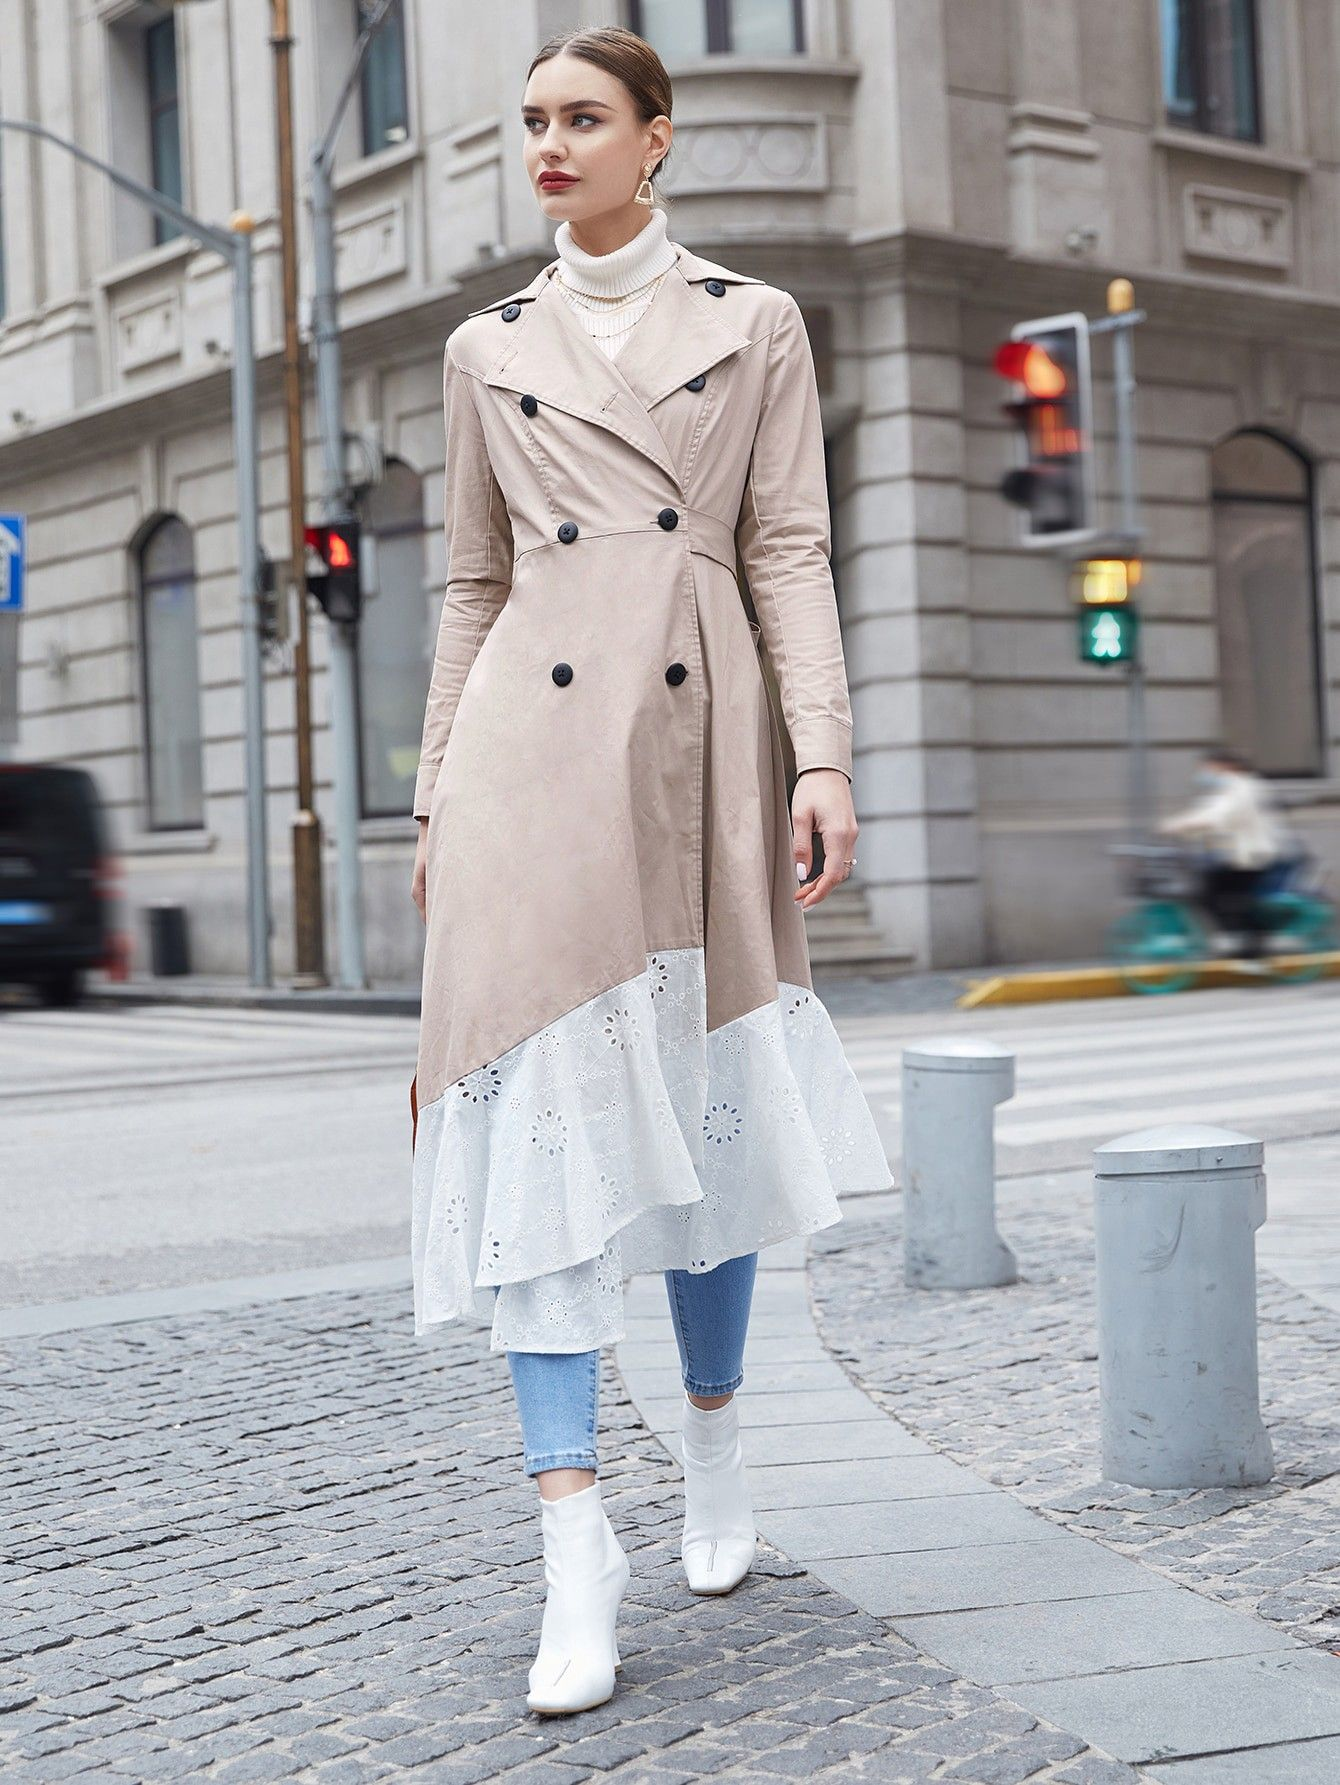 Pin By Ghenima On Ghenima In 2021 Coat Trench Coat Fashion